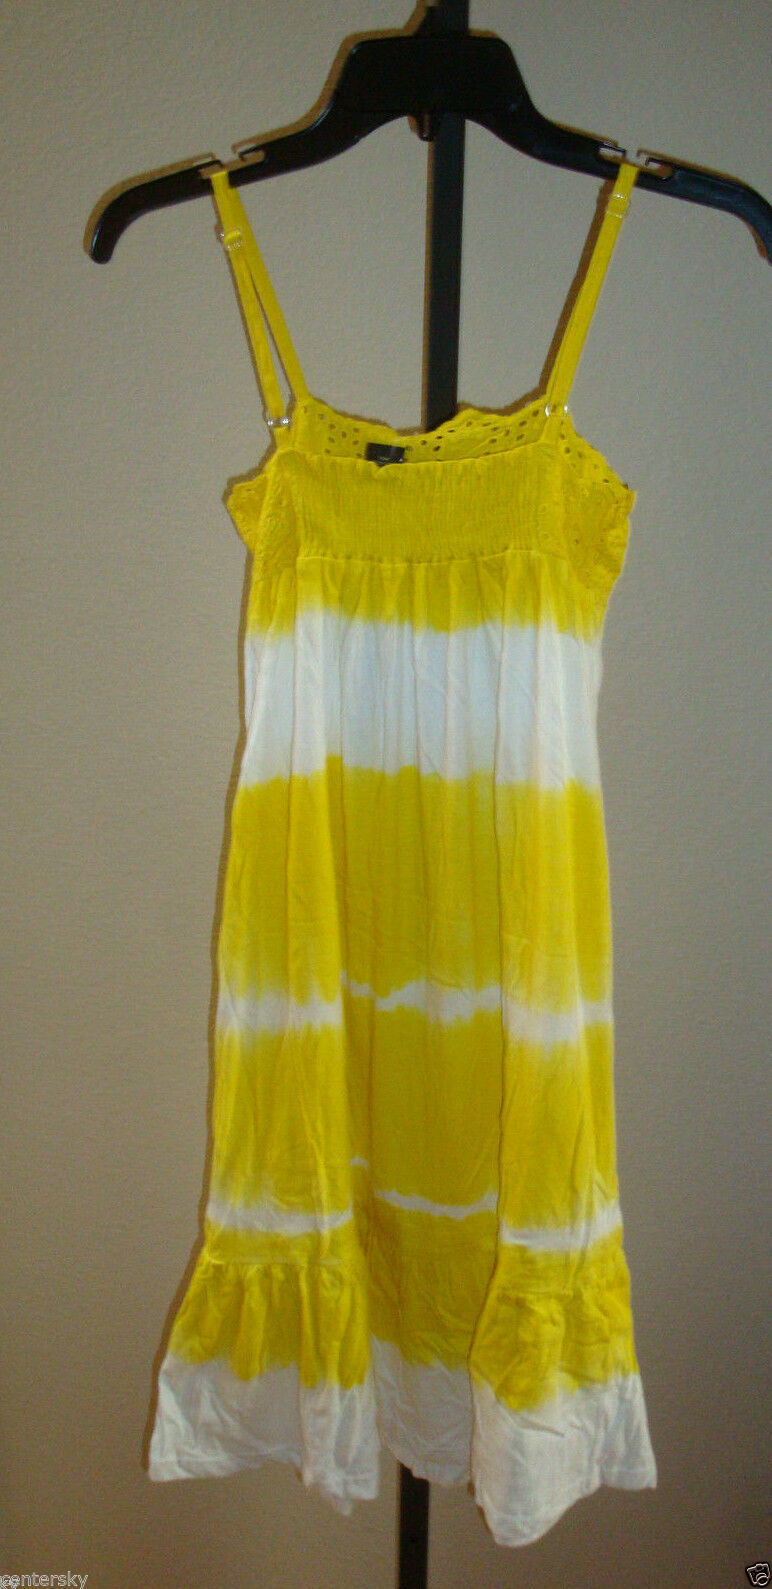 New $39 Raviya Women's Swimsuit Cover-up Lounge Beach Dress Yellow Wht Tie Dye S image 2